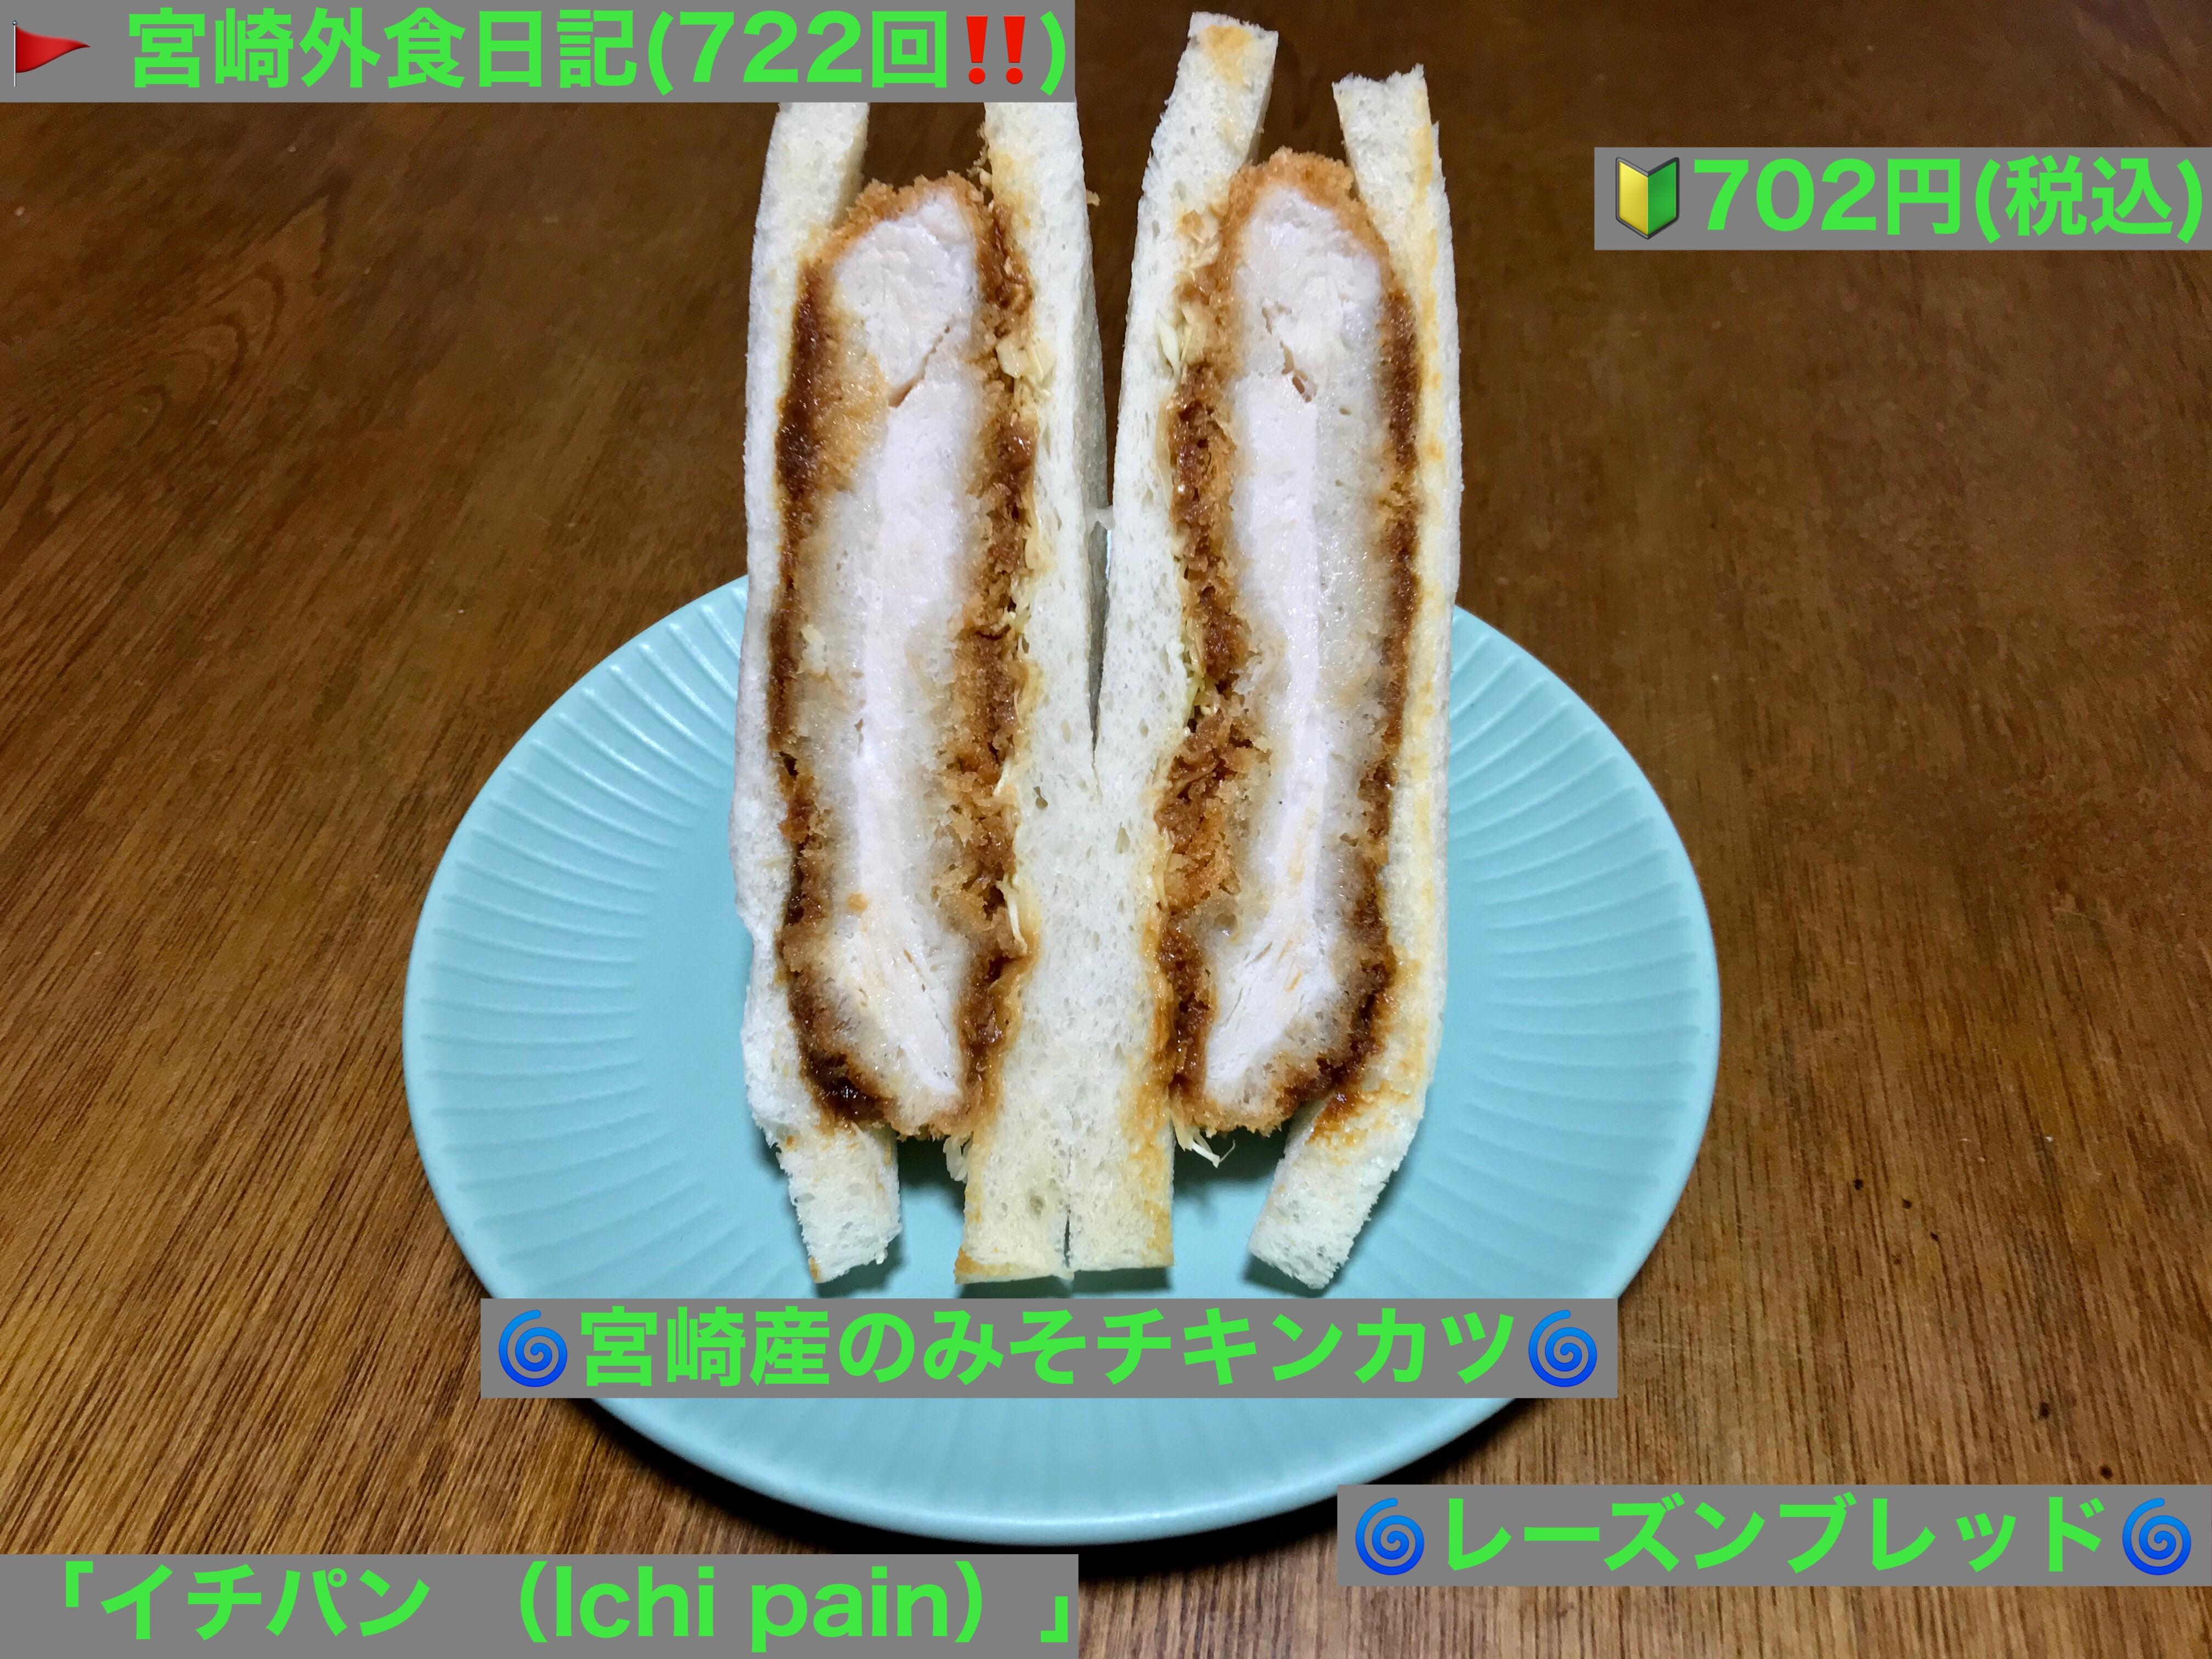 f:id:yoshink4:20210522181500j:image